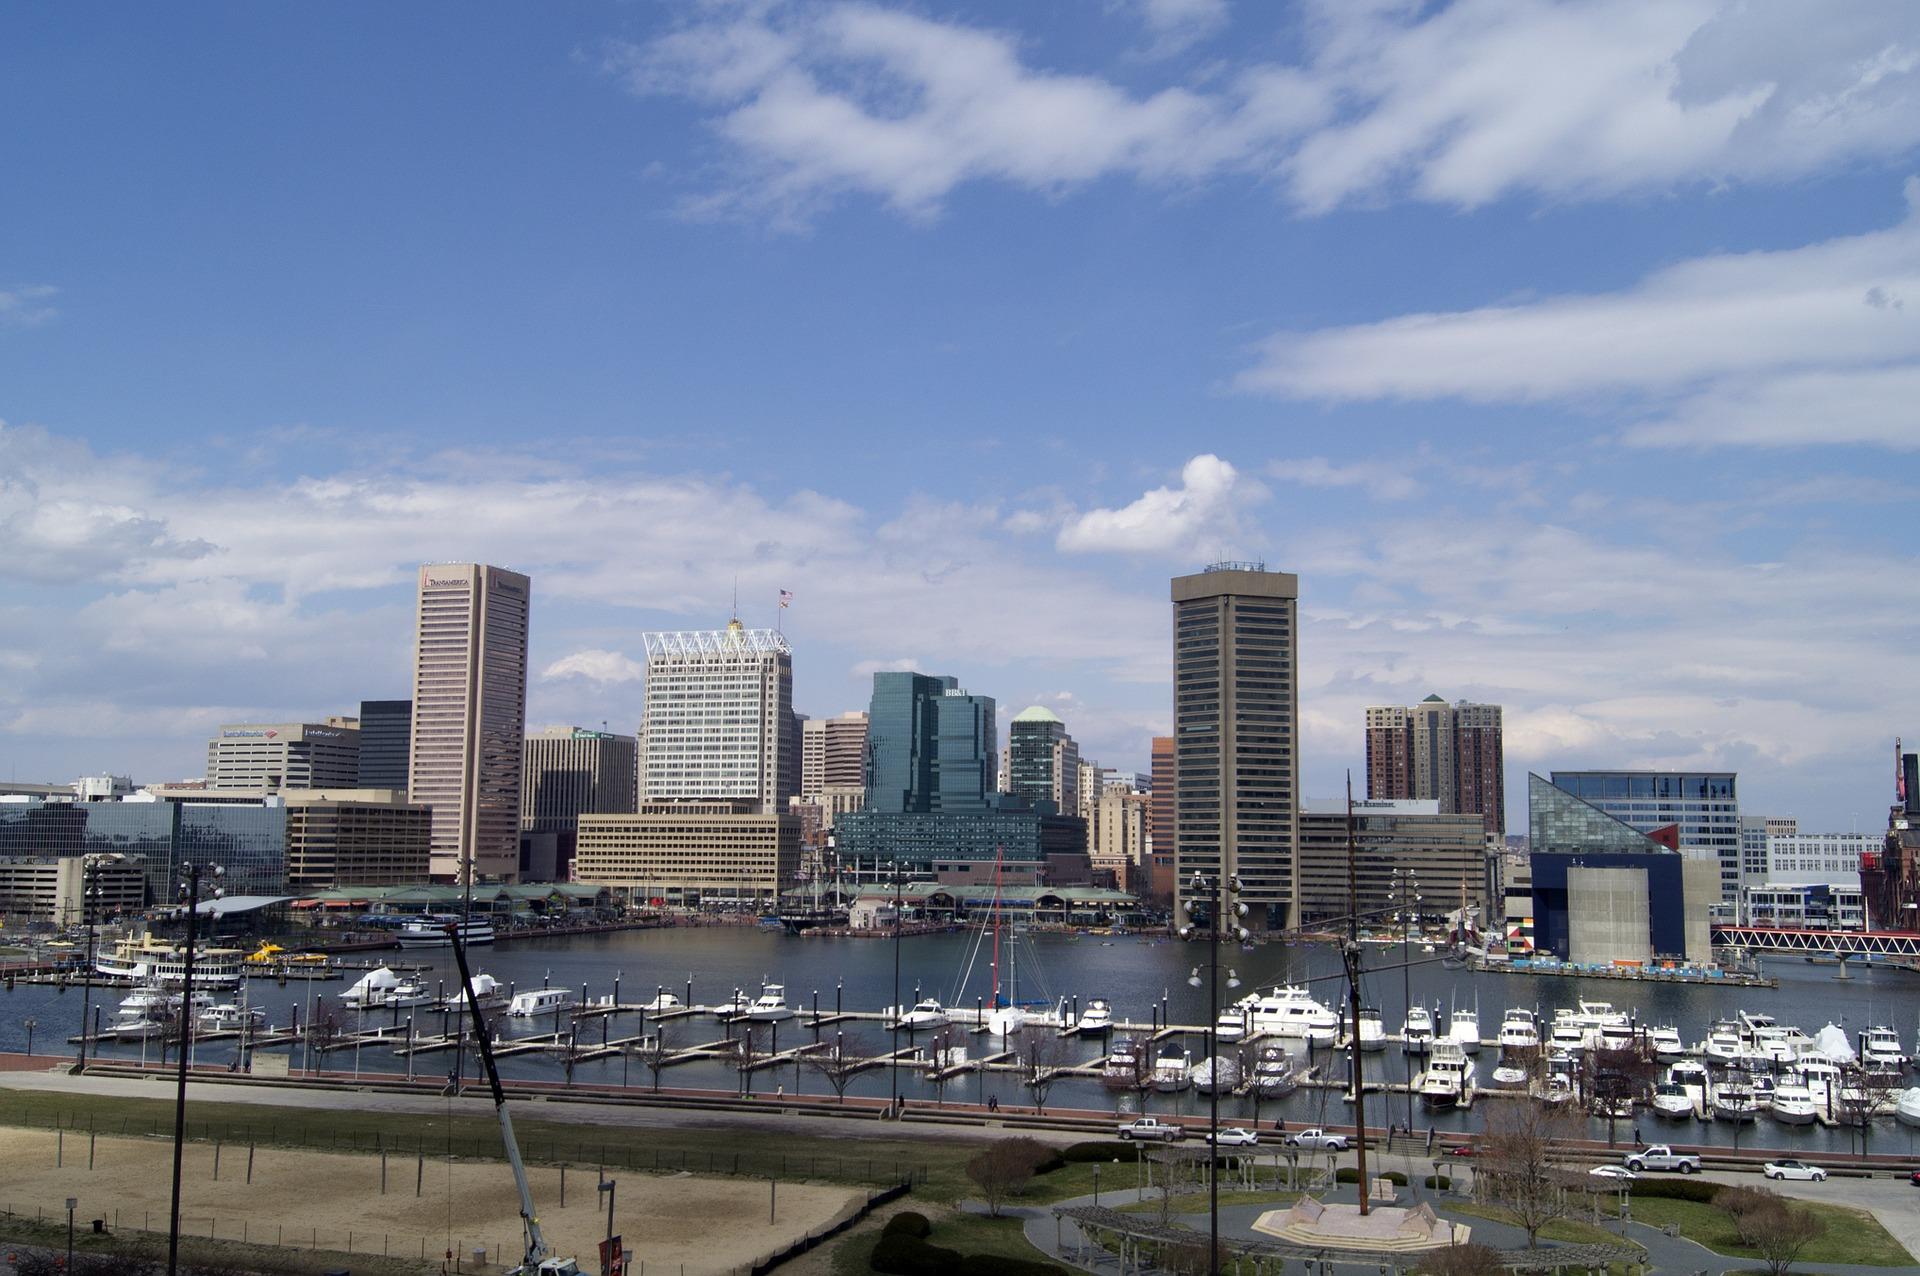 Baltimore, from Professor Slots blog on Maryland slot machine casino gambling.